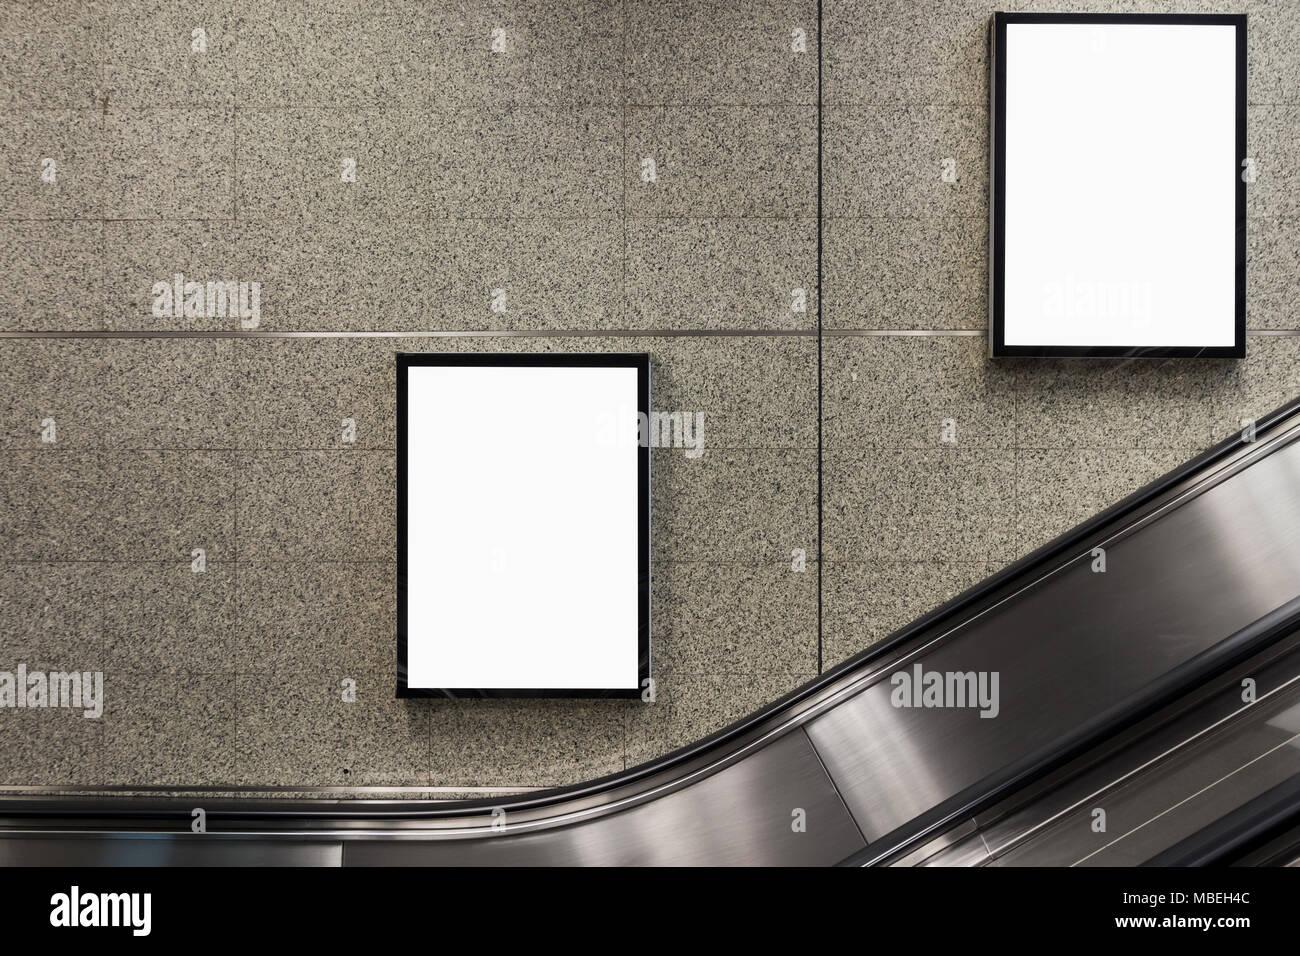 Underground Escalator Advertising Stock Photos Underground